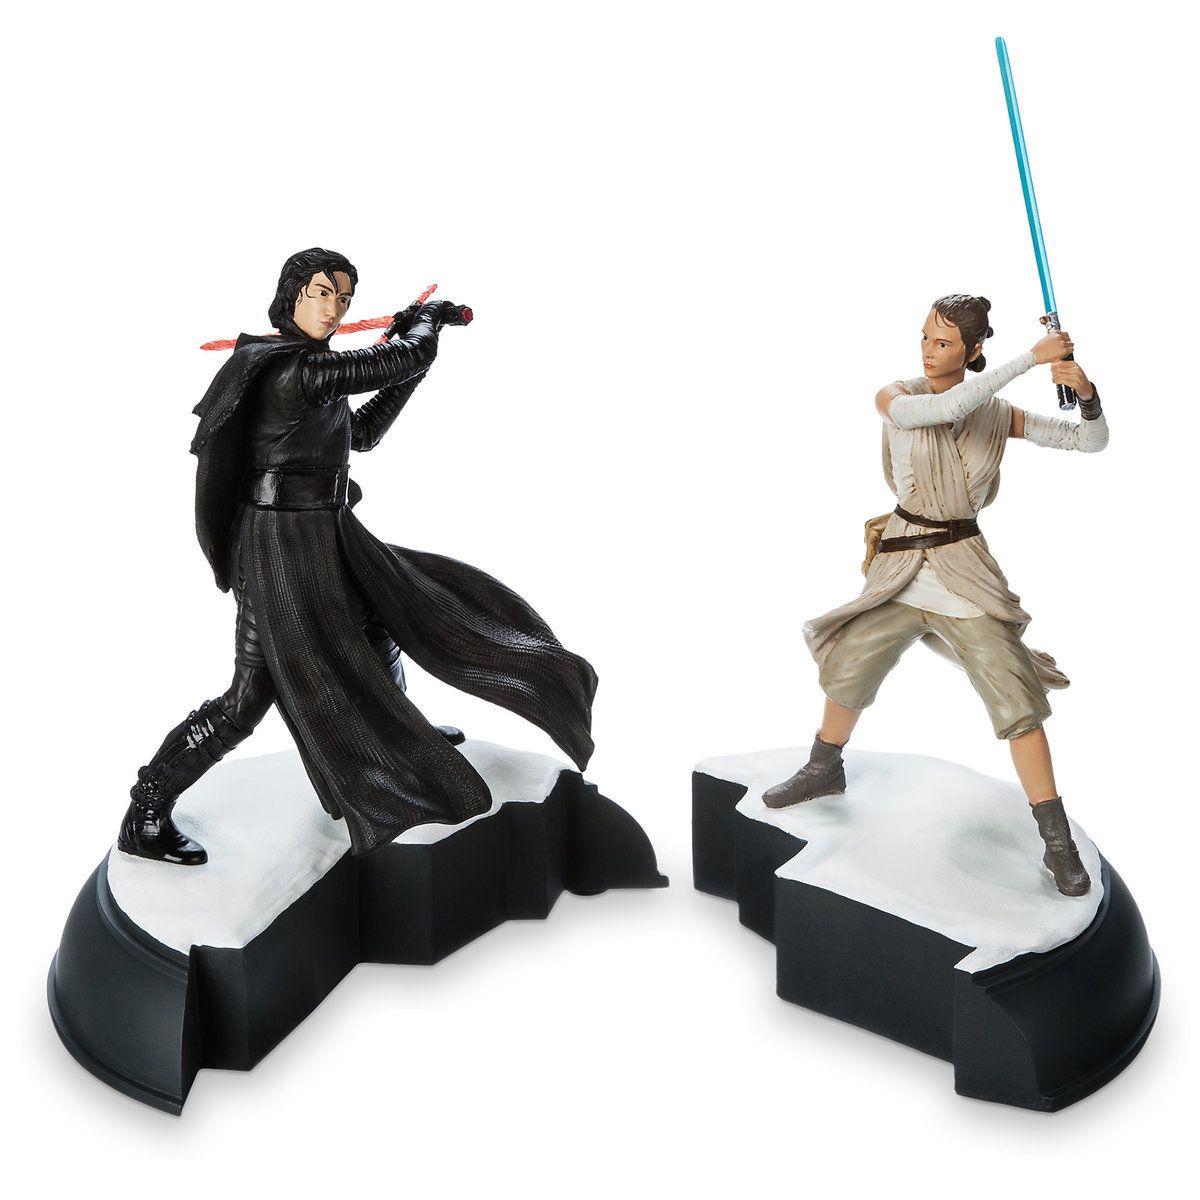 Ren Rey Force And Set Figurine Kylo Star Awakens WarsThe rdsChQBtx